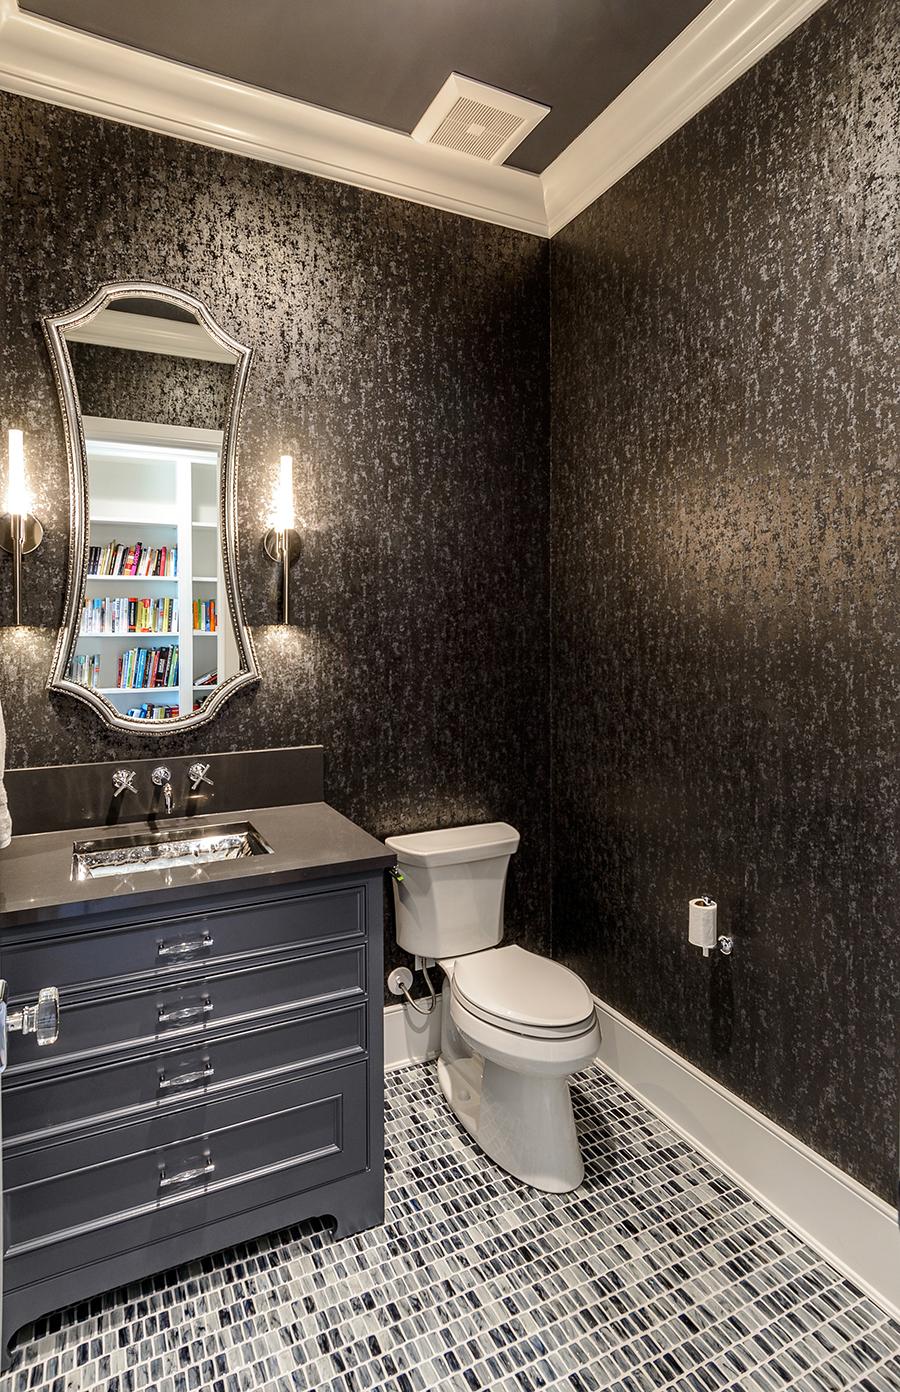 Belle Kitchen Interior Design Designer Luxury Minnesota MN Mpls Minneapolis St Paul Twin Cities18.jpg